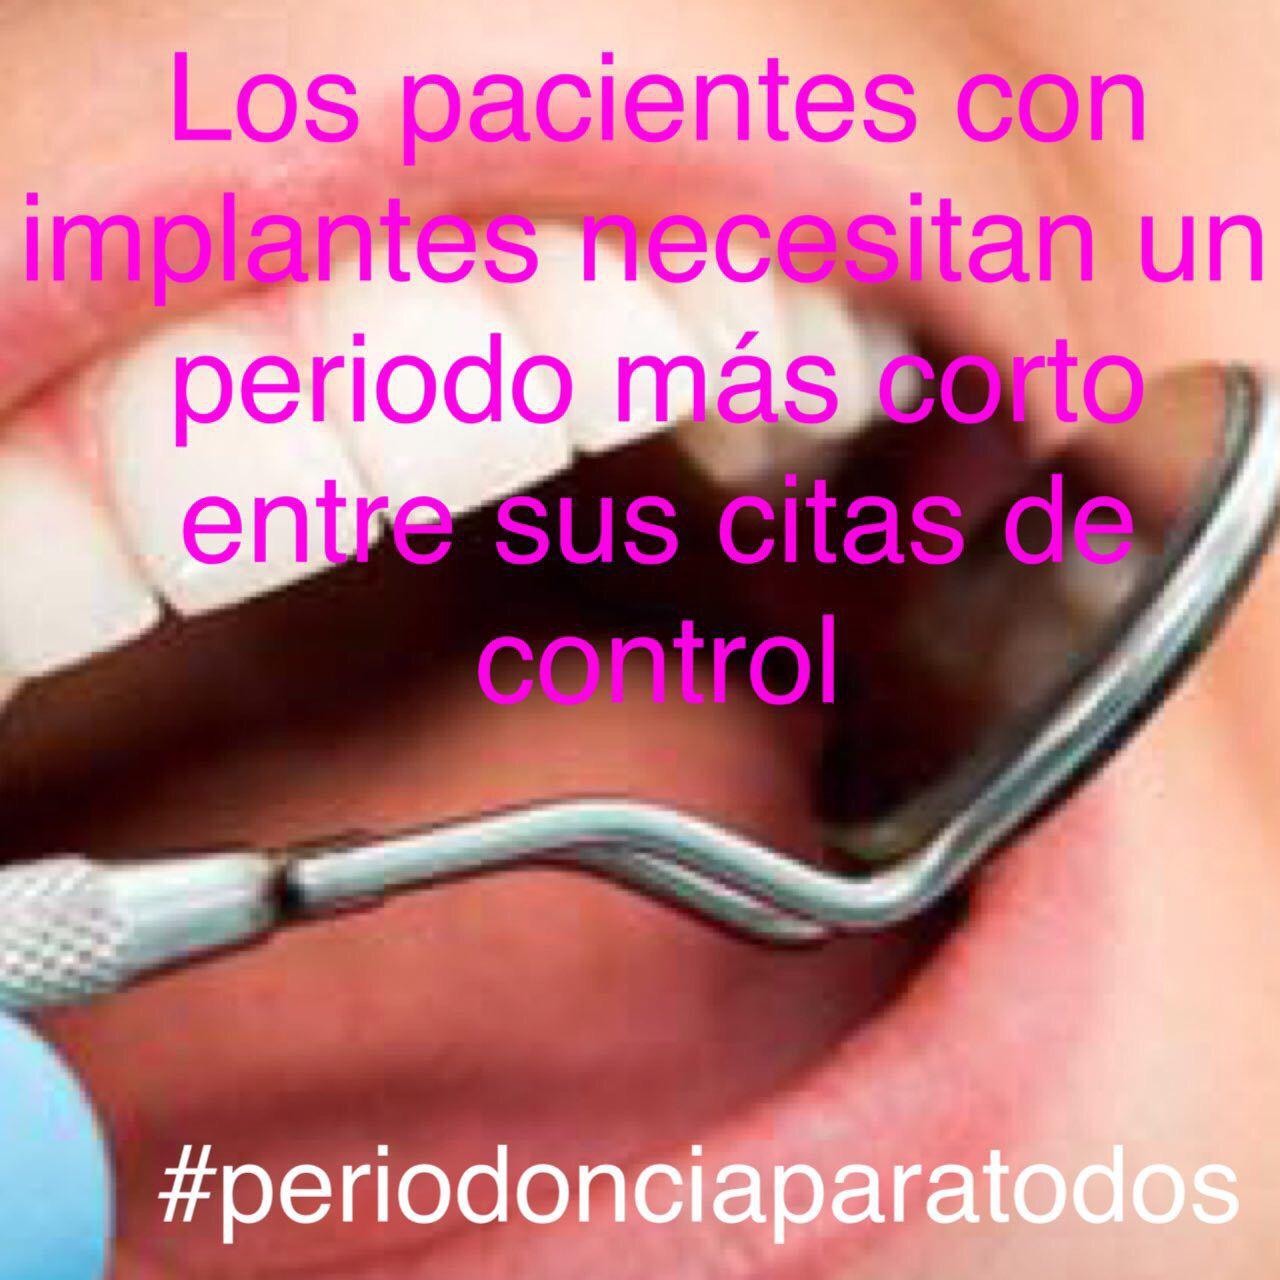 #periodonciaparatodos